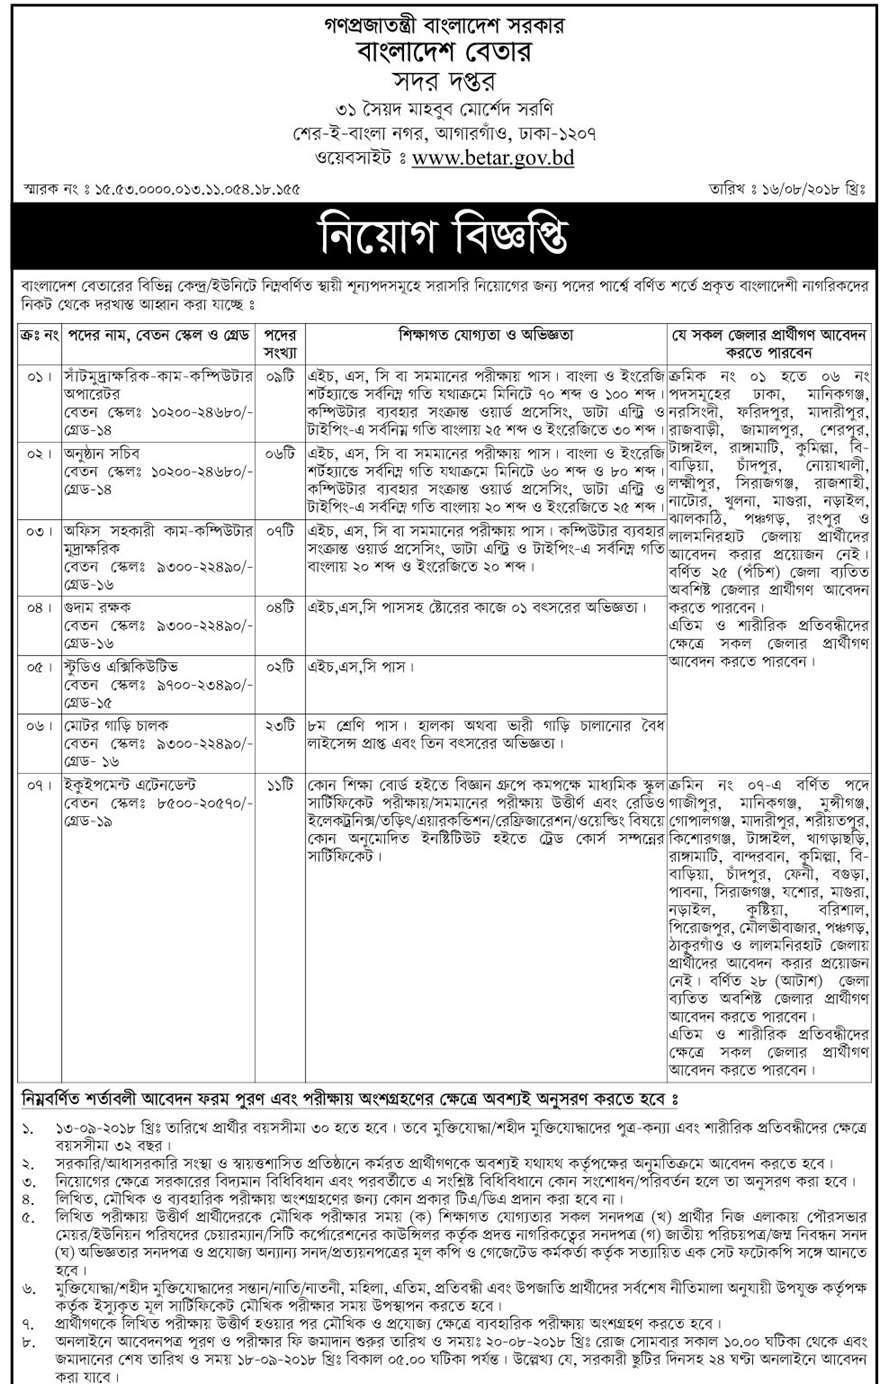 Bangladesh Betar Job Circular Apply